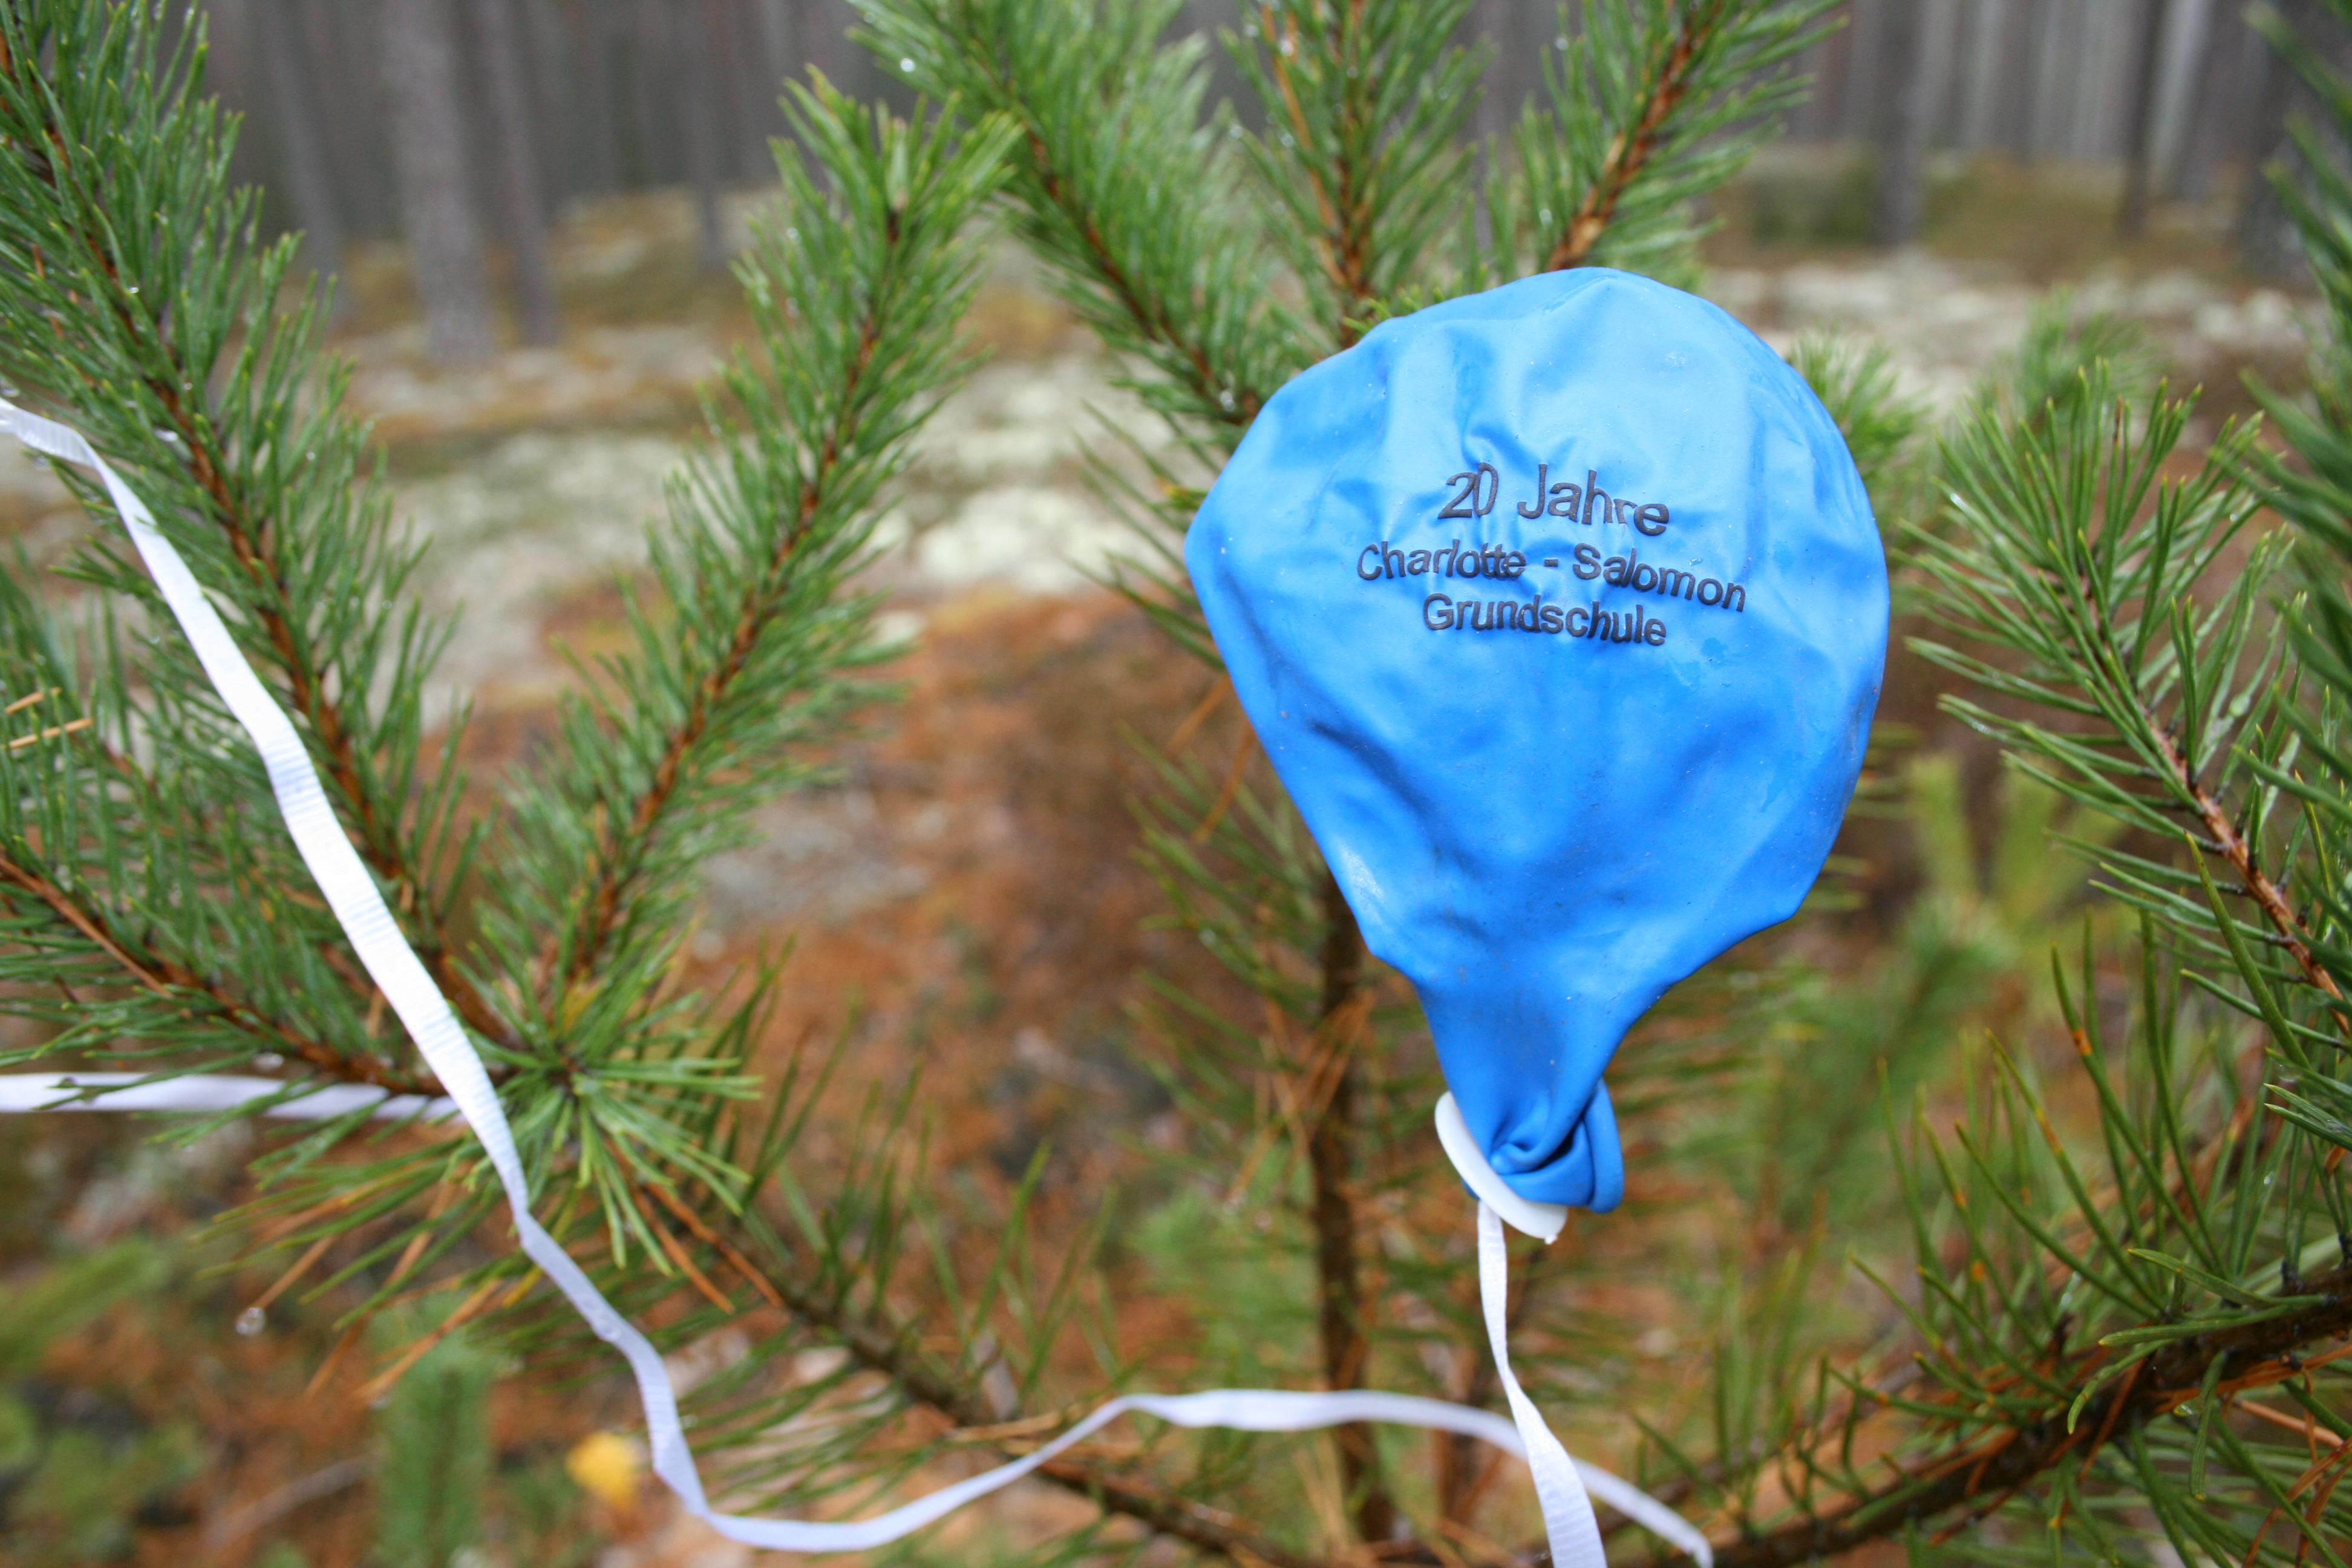 kosten charm klassischer Chic attraktive Farbe File:Balons atlidojis 995 km no Berlin Charlotte-Salomon ...